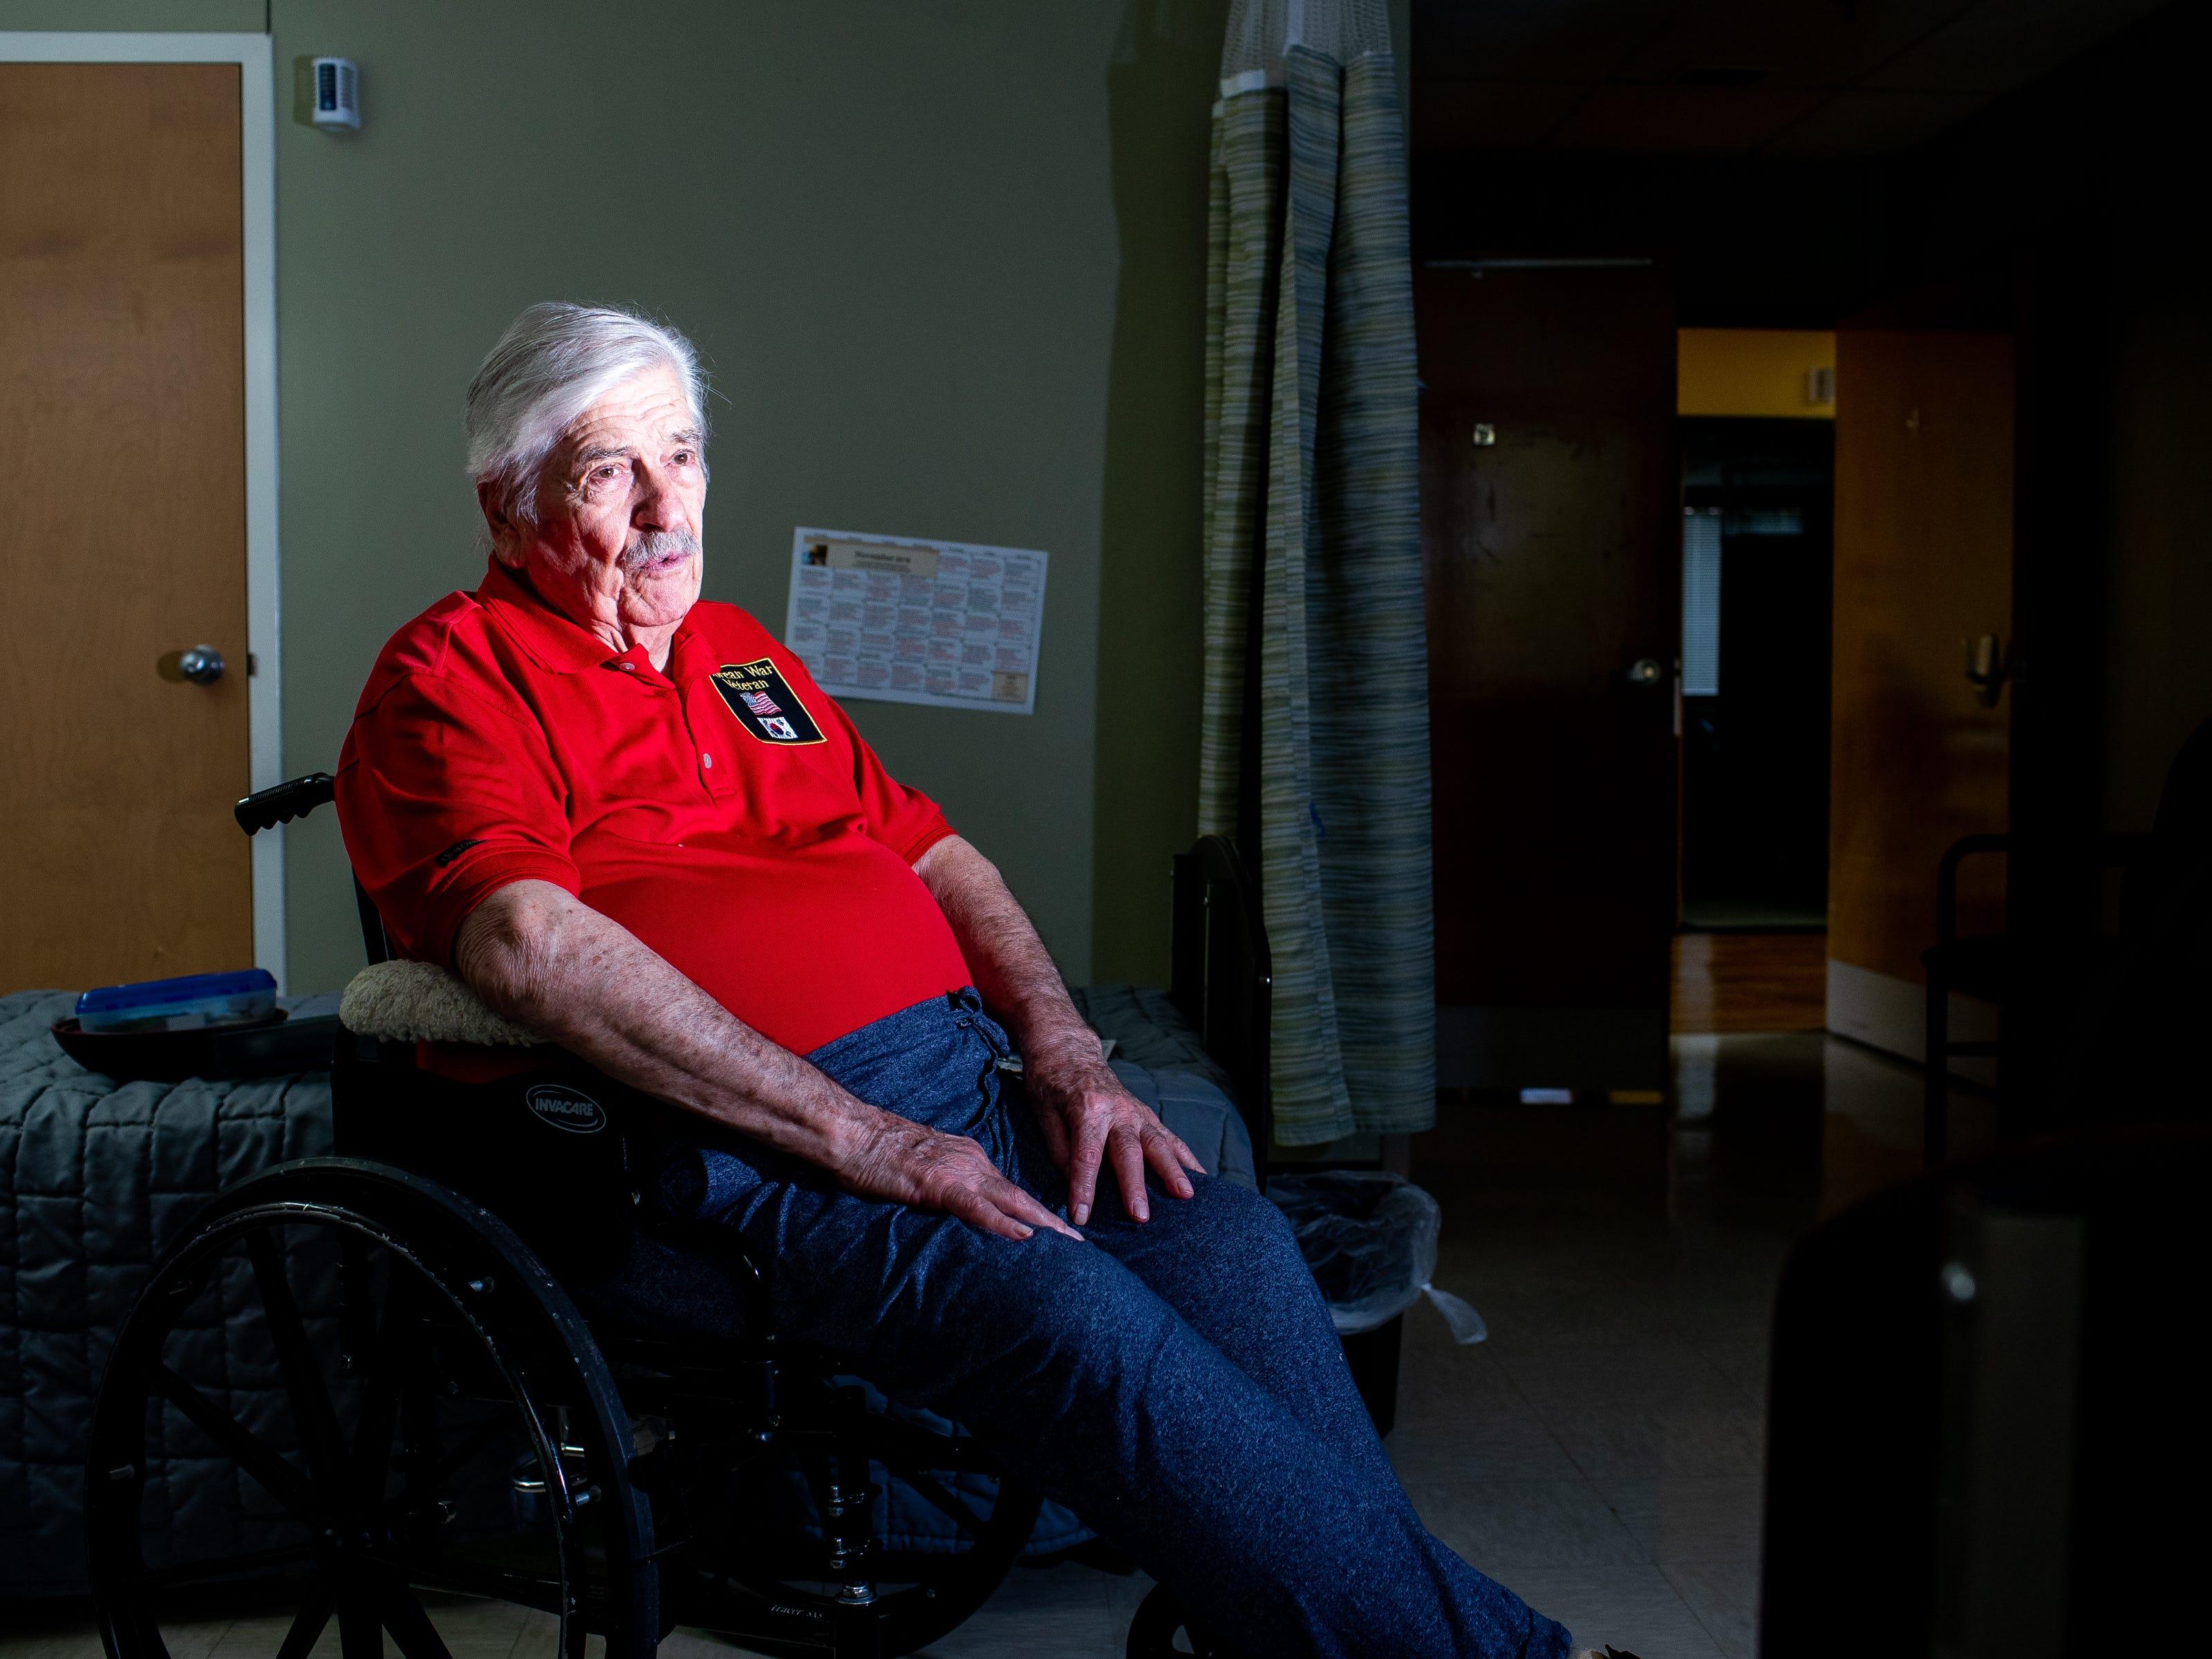 Home again: The return of 6 veterans in 100 years of war